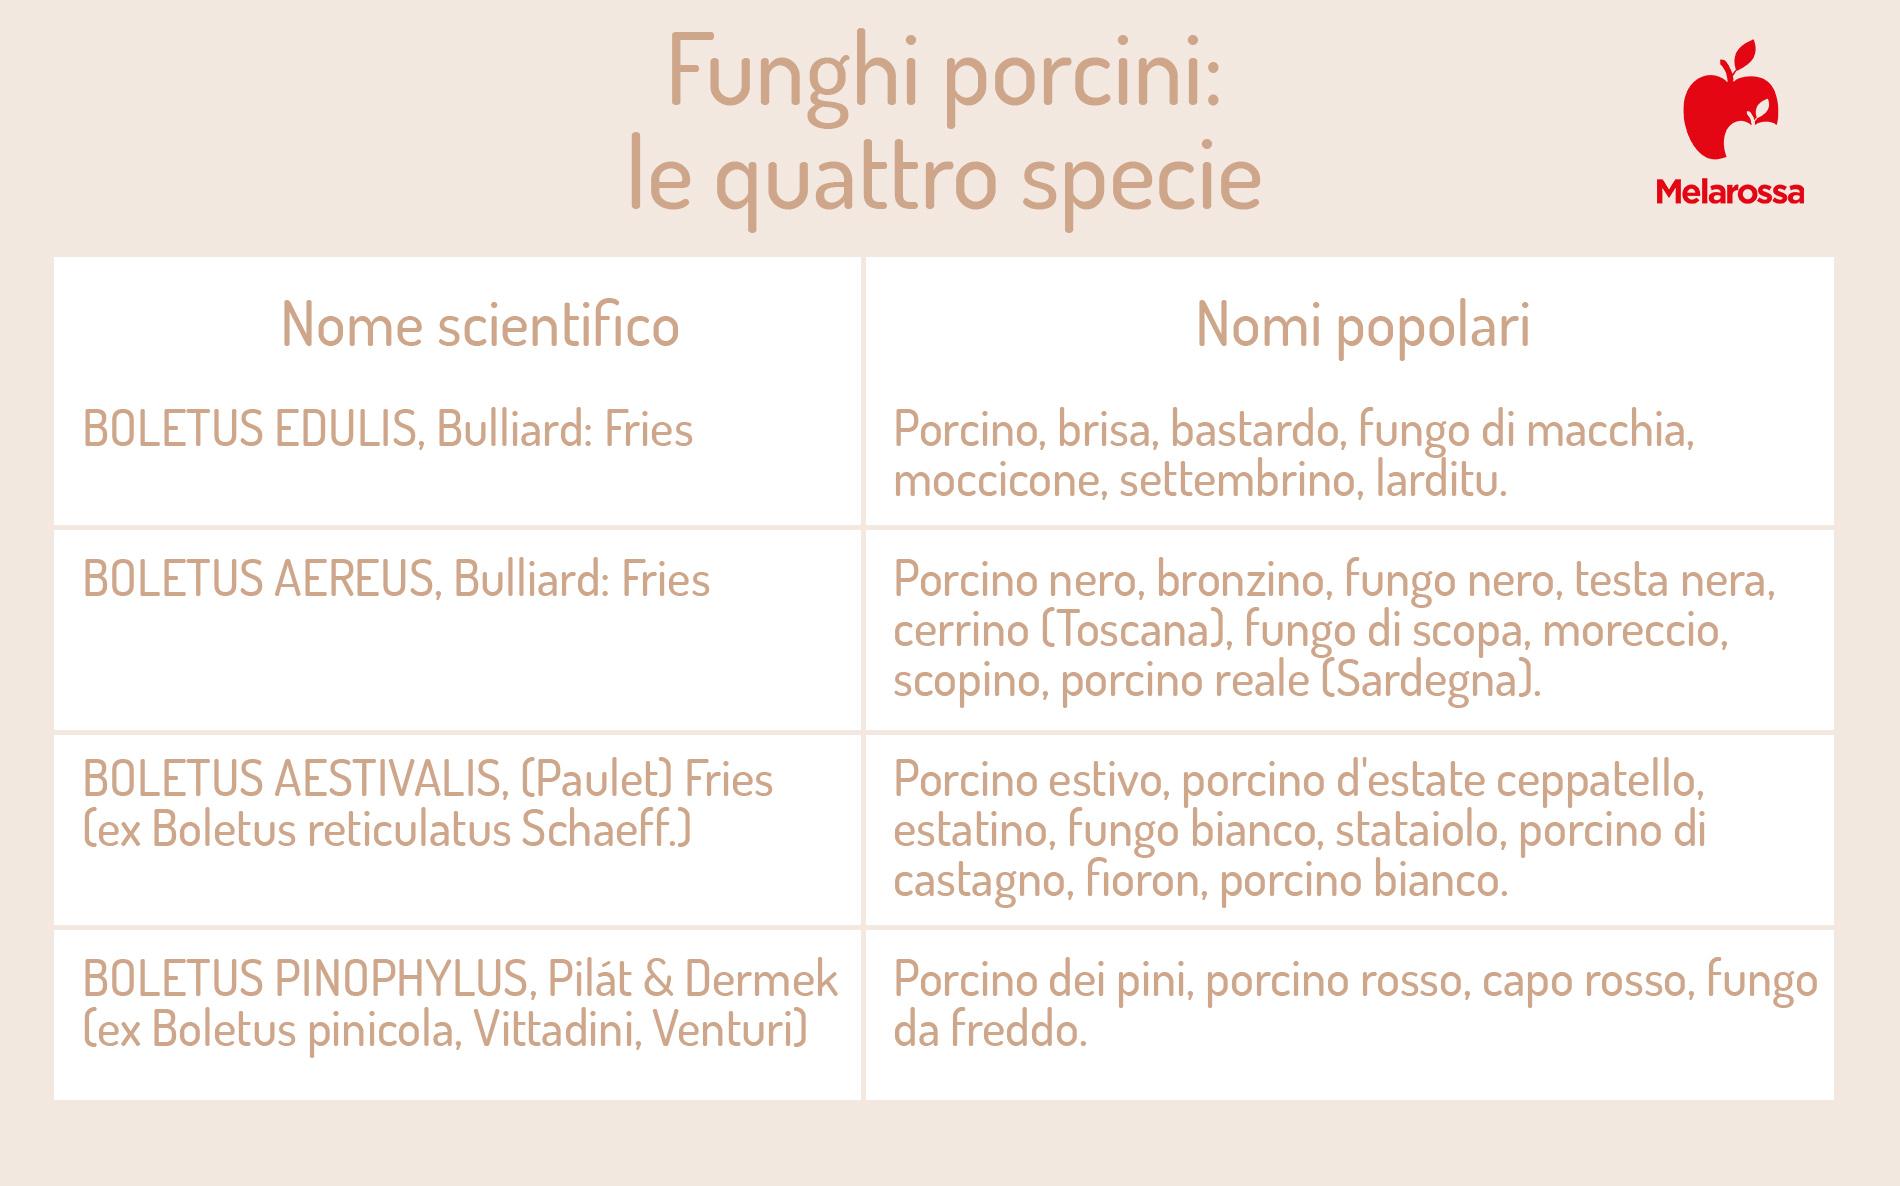 funghi porcini: specie